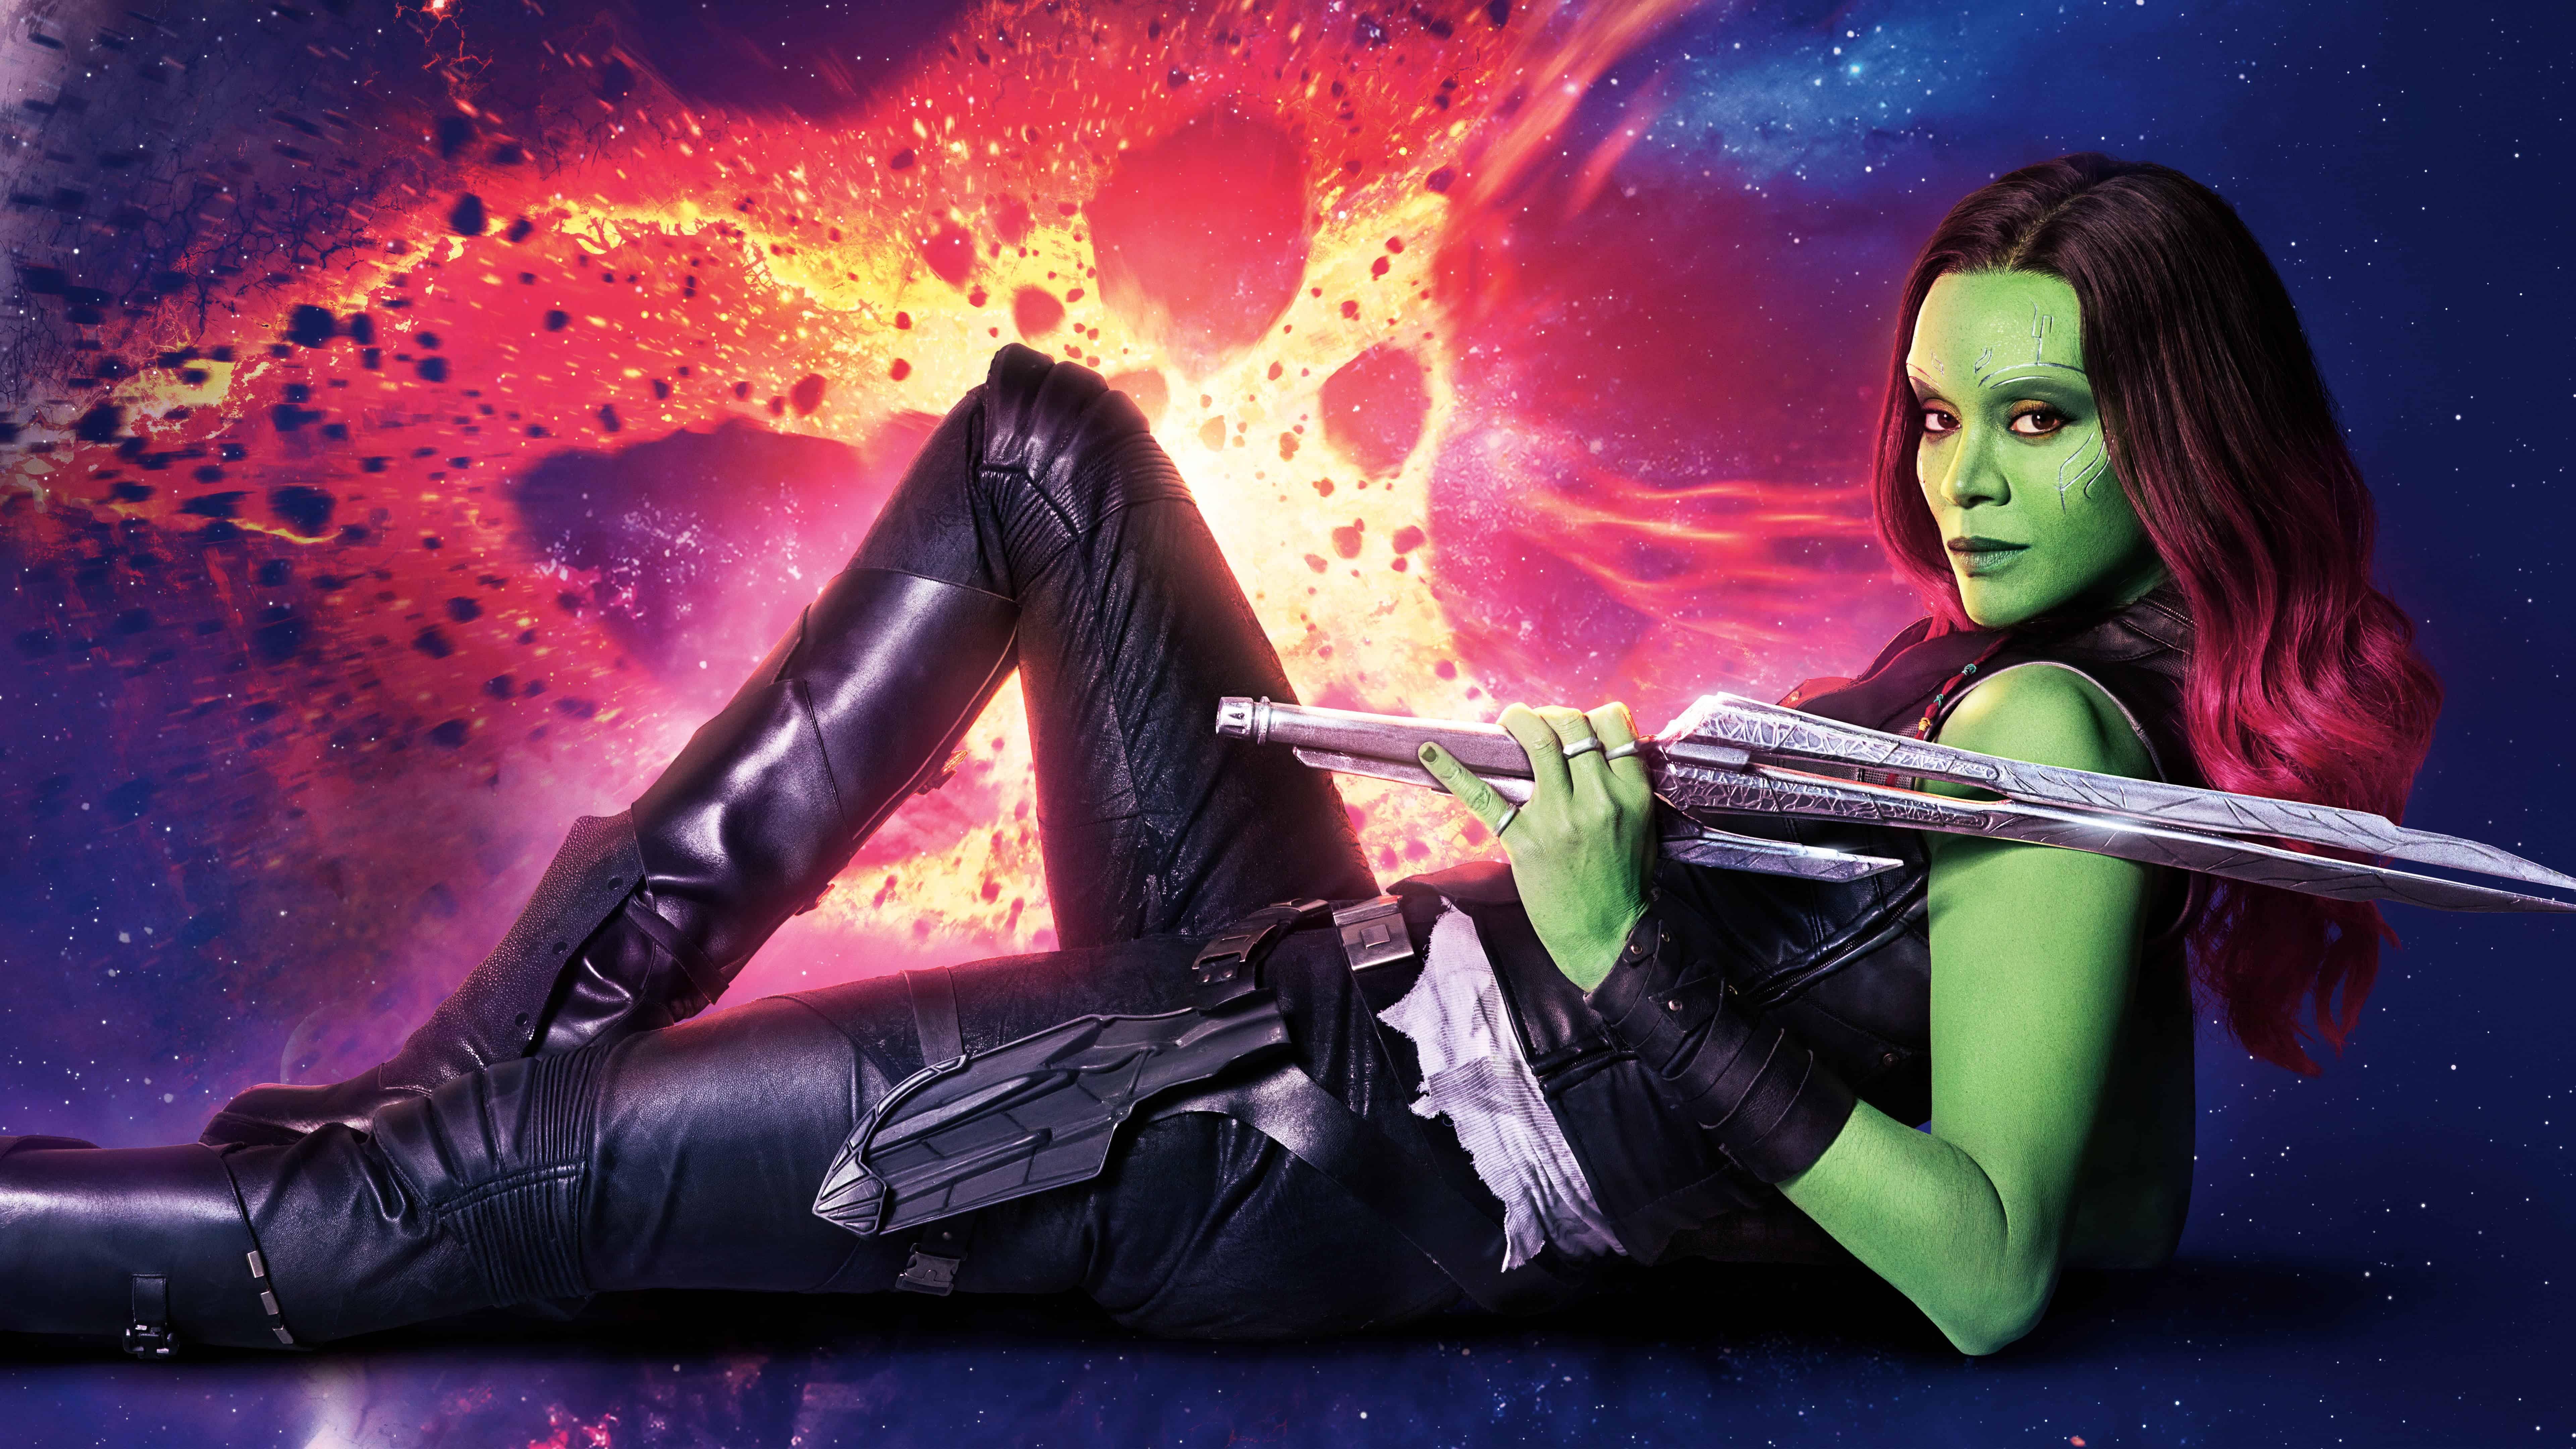 Guardians of the galaxy vol 2 gamora uhd 8k wallpaper pixelz - Guardians of the galaxy 2 8k ...